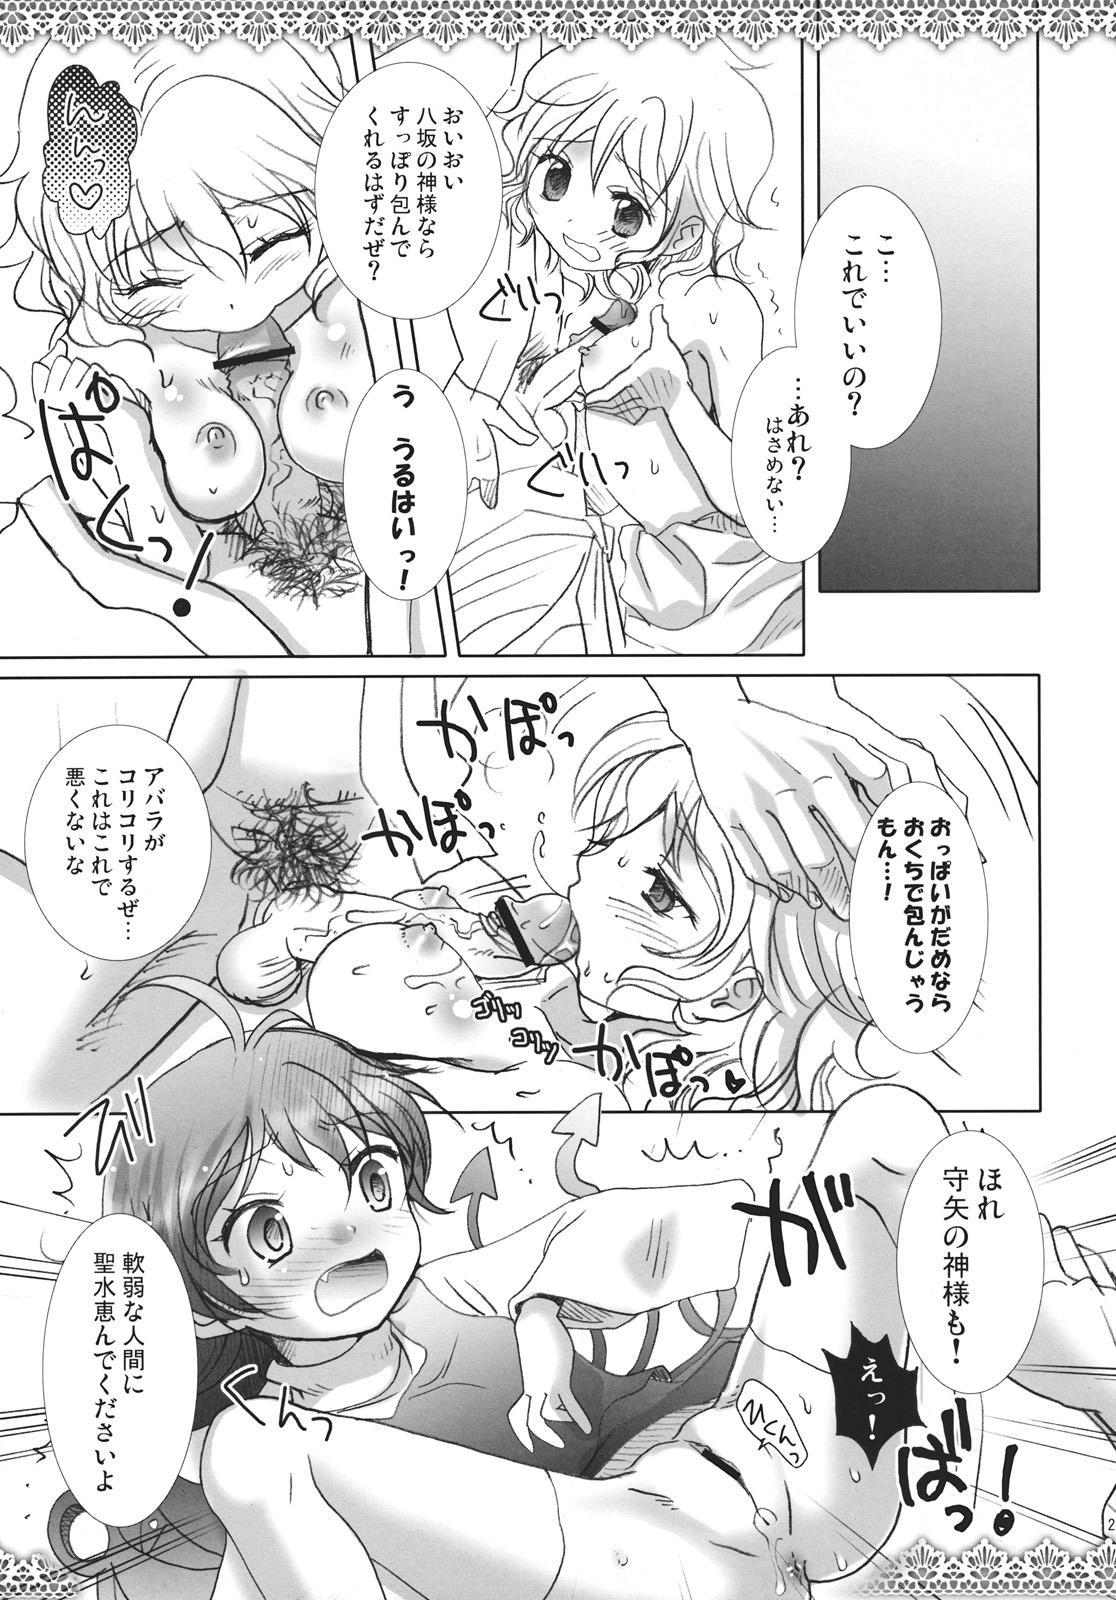 Sanae-san funtouzhu! 20